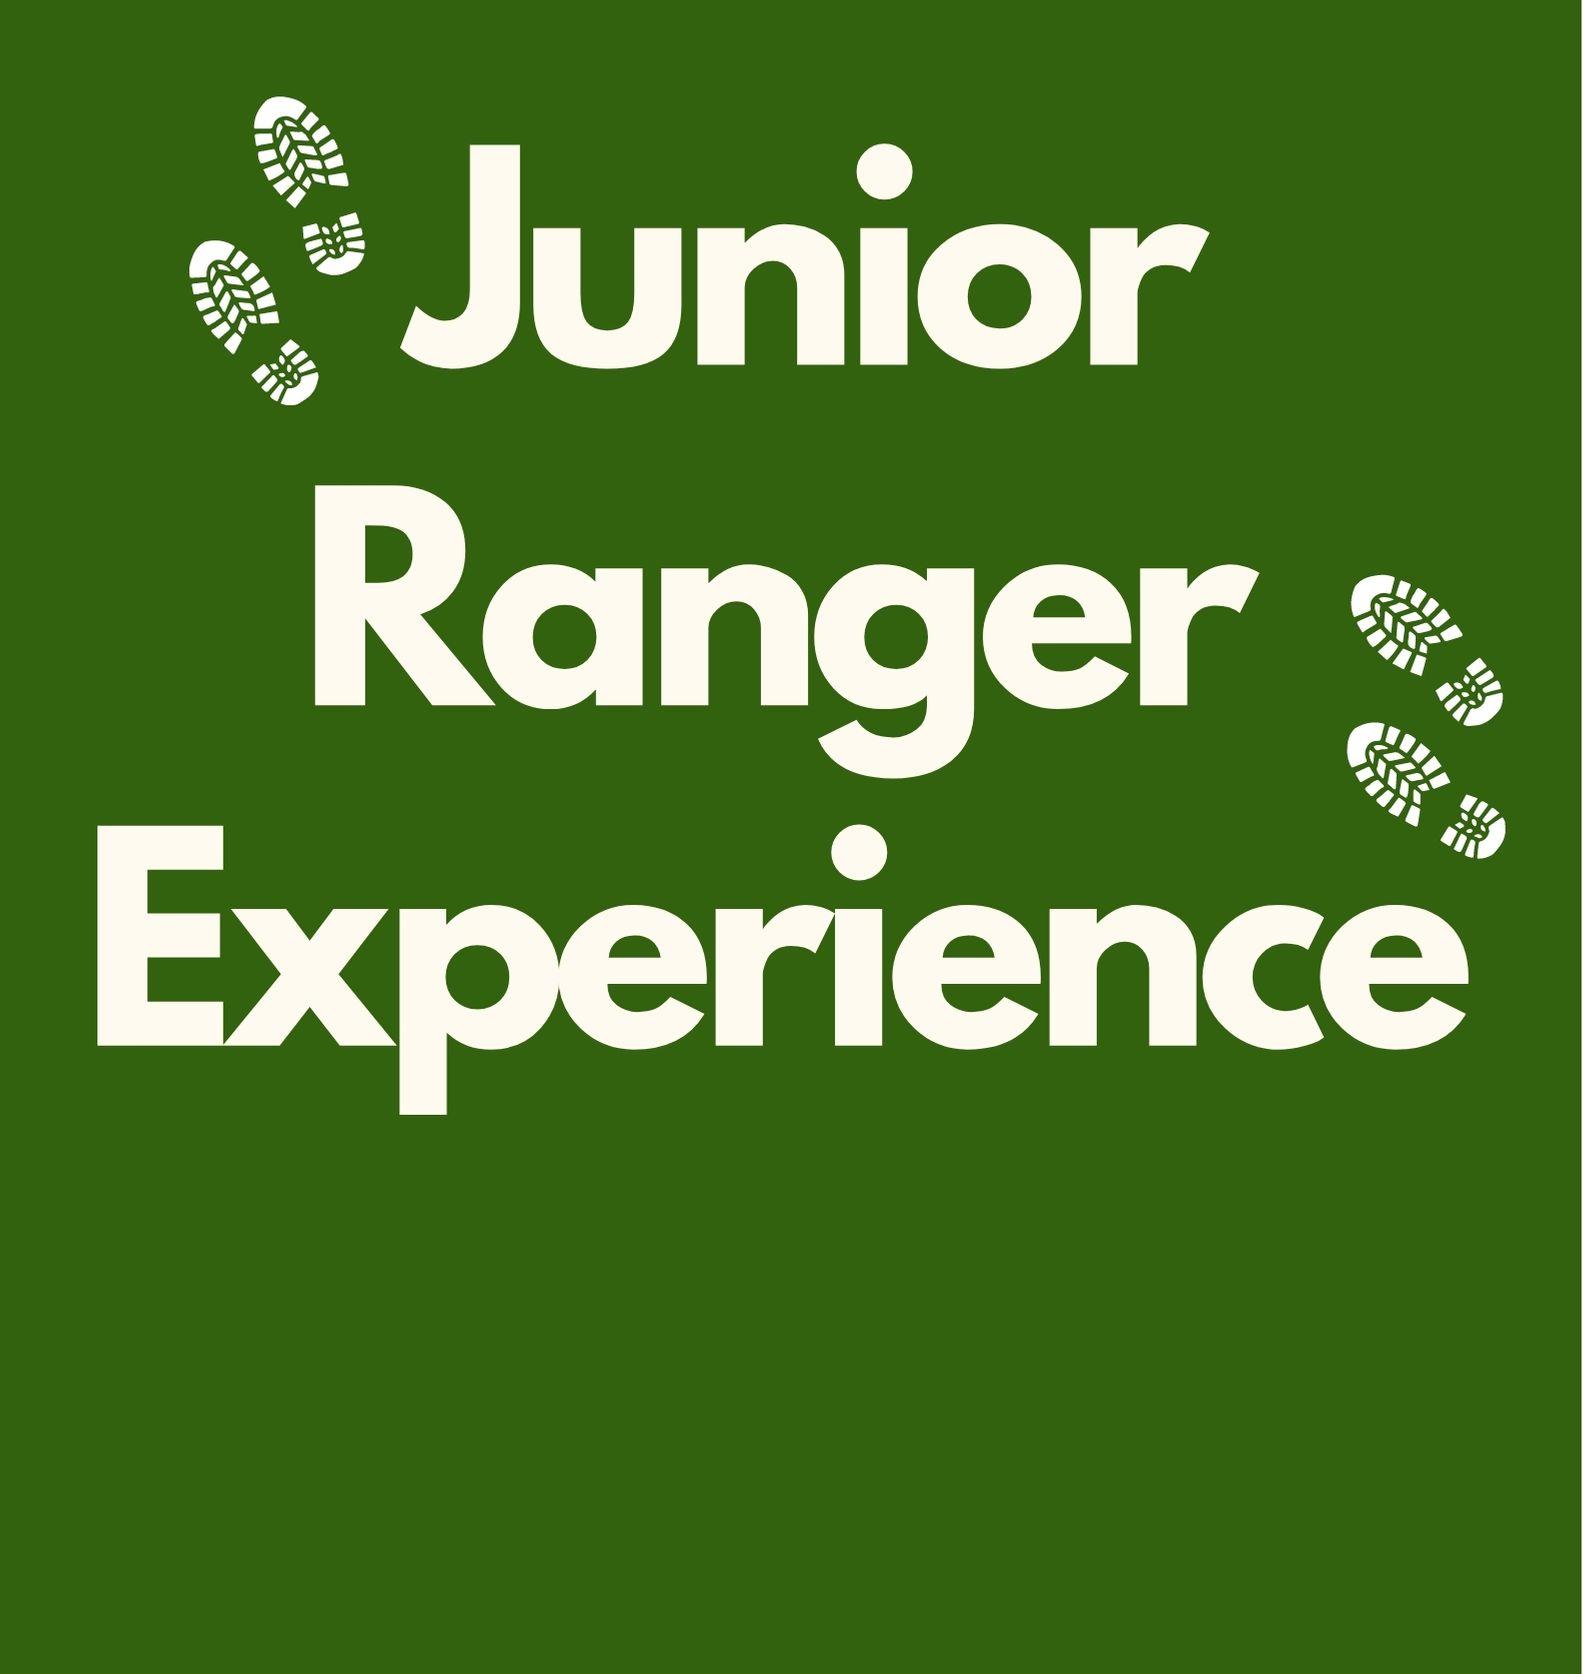 Junior Ranger Experience